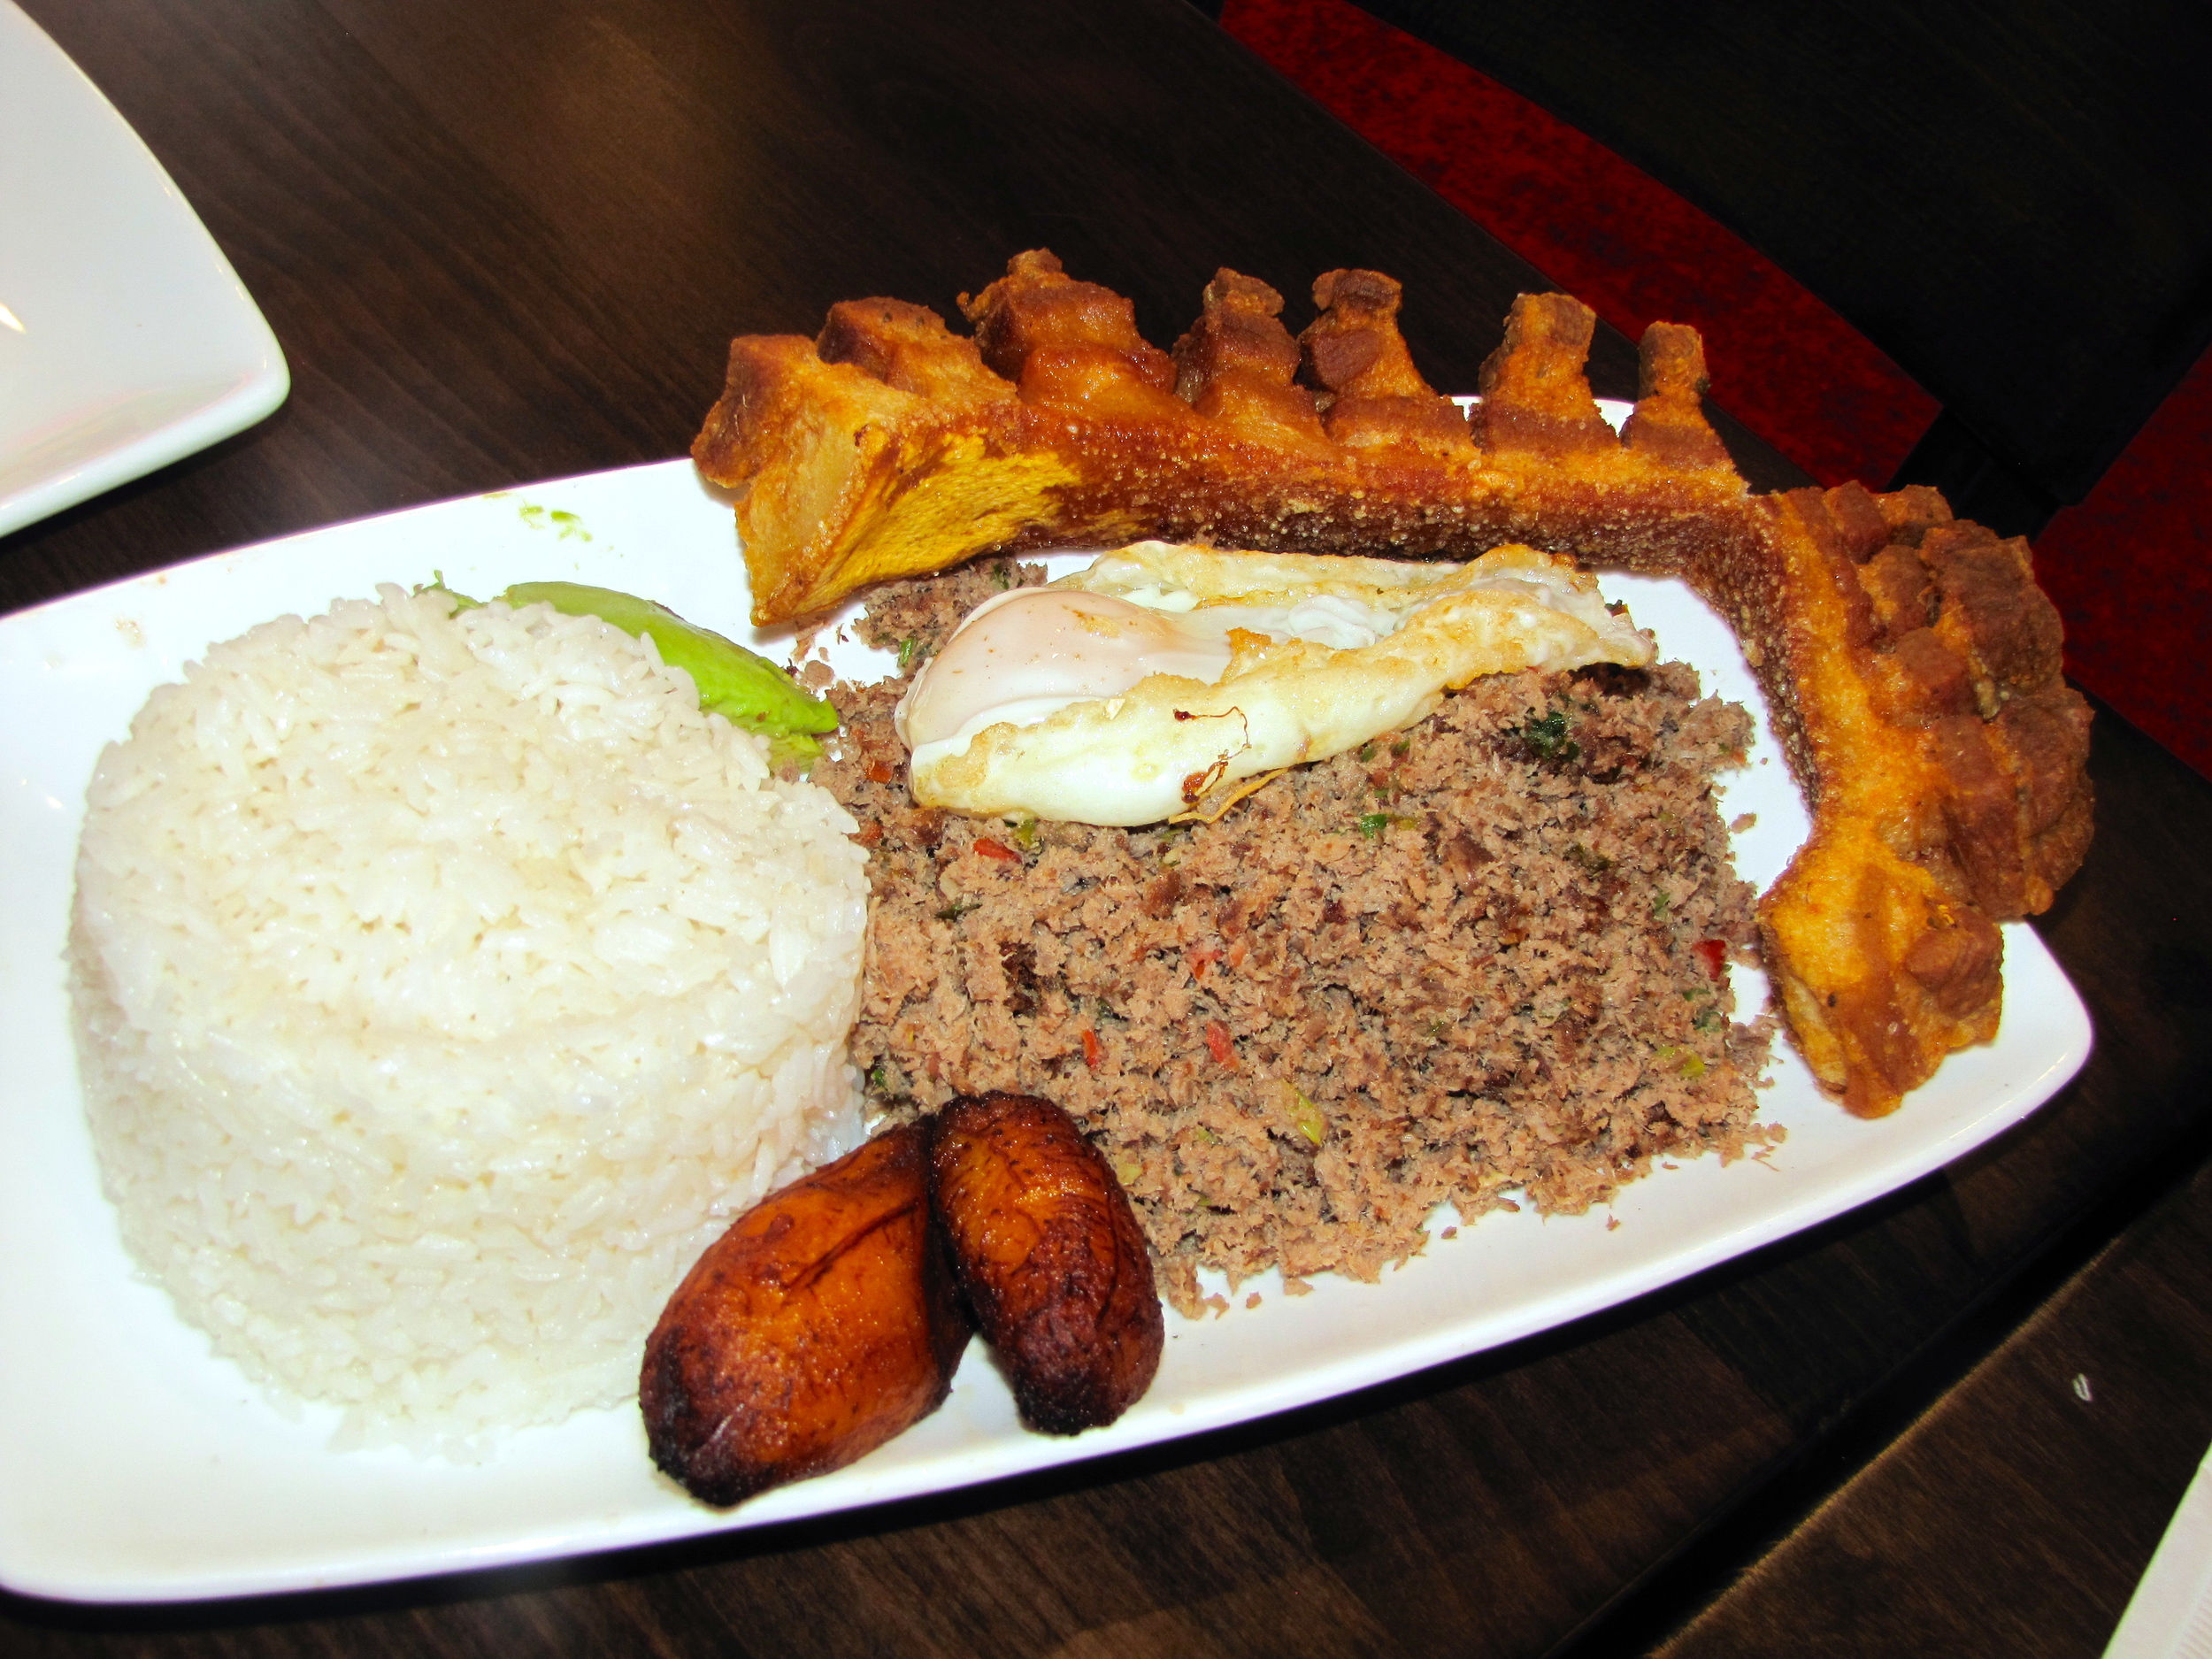 Bandeja Paisa with ground beef